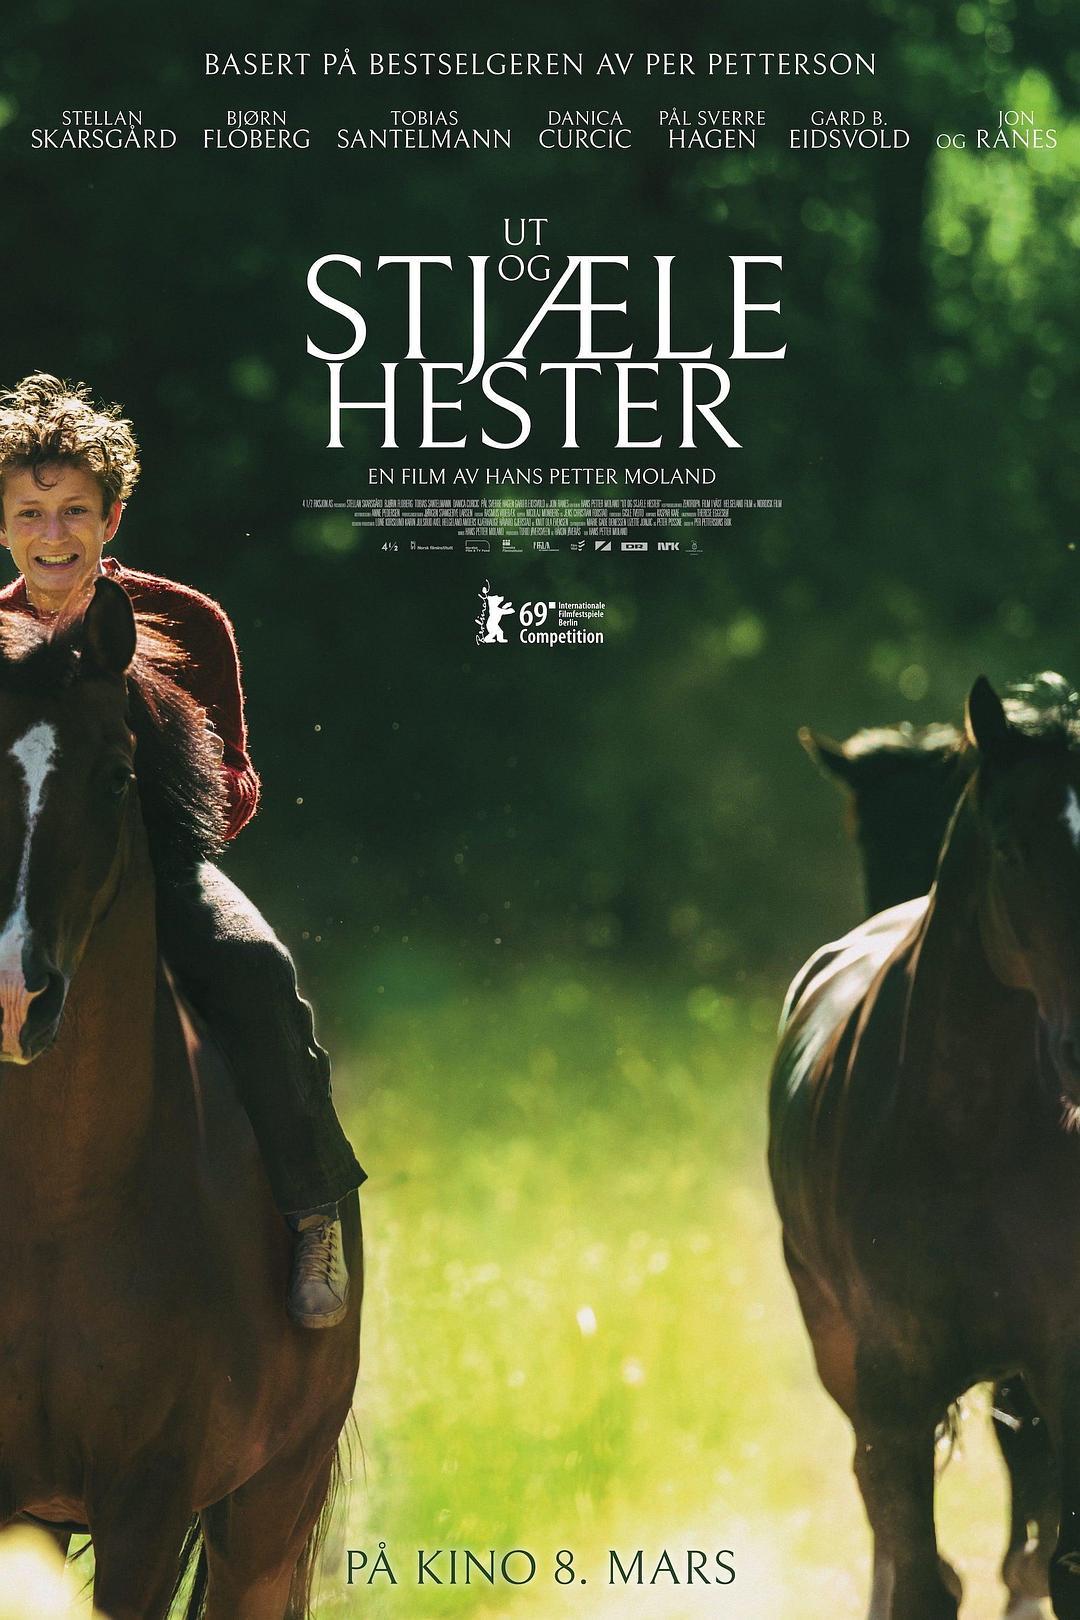 外出偷马 蓝光高清MKV版/Out Stealing Horses 2019 Ut og stjæle hester 10.2G